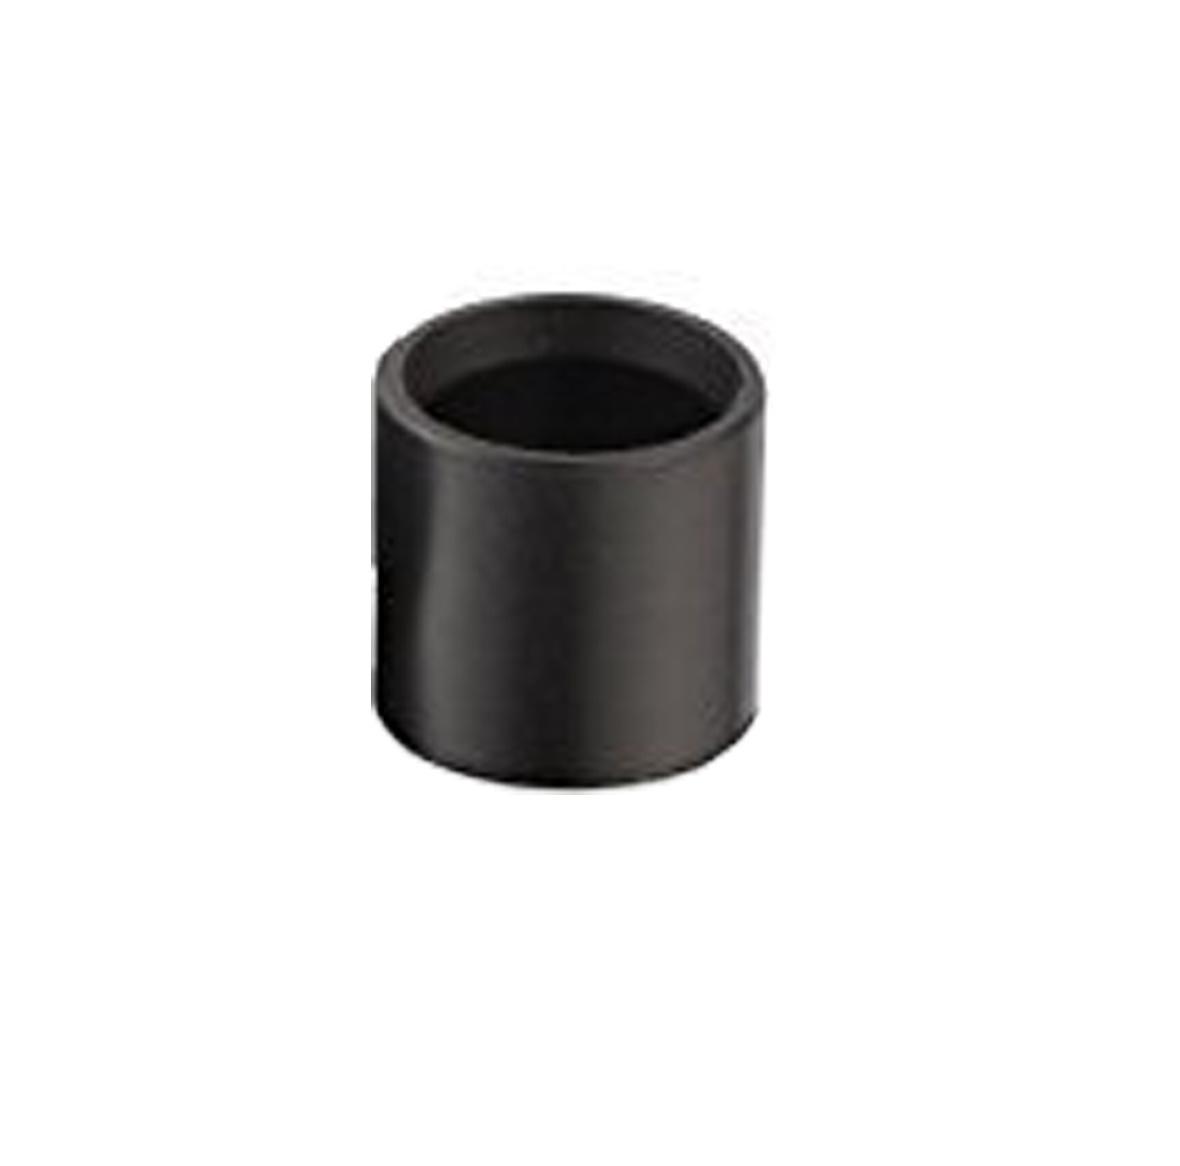 Aspire Nautilus X & PockeX Pocket AIO mouthpiece (10 pieces)